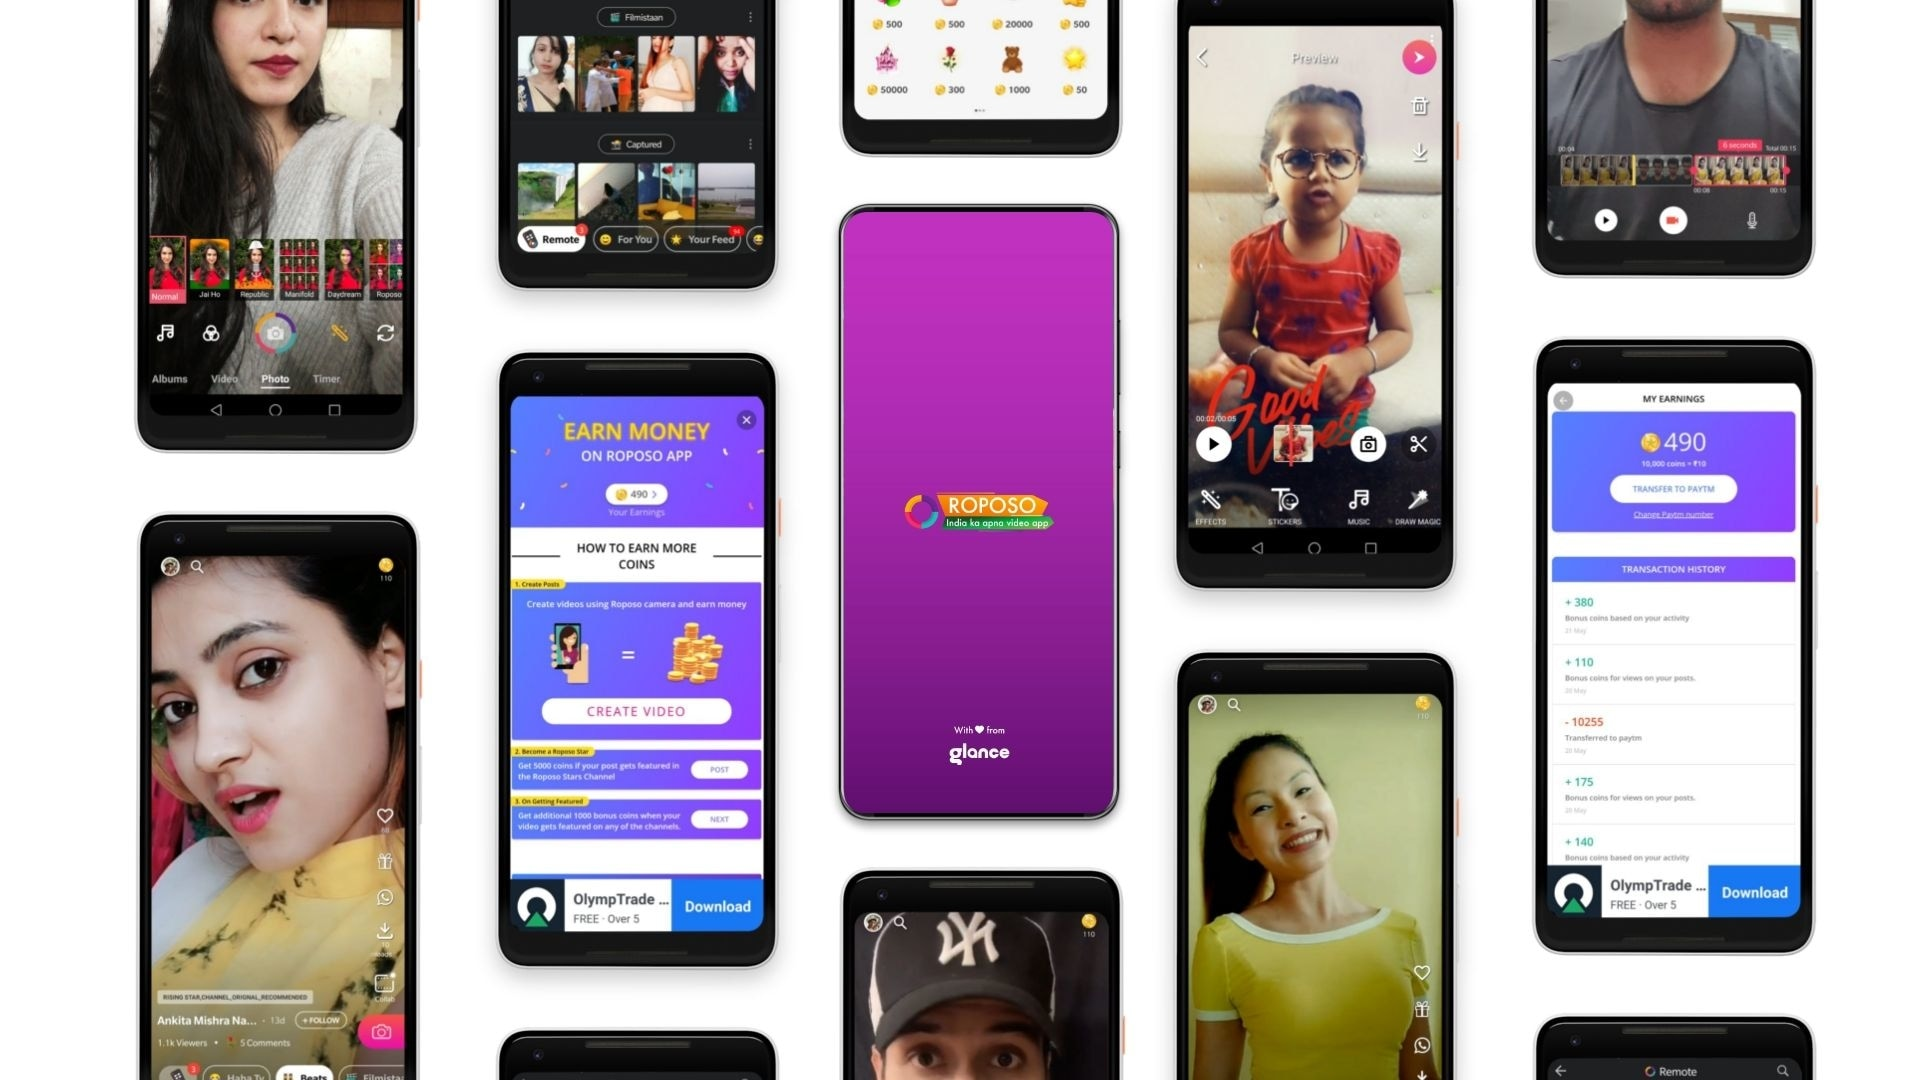 Roposo short video app has over 65 million downloads.